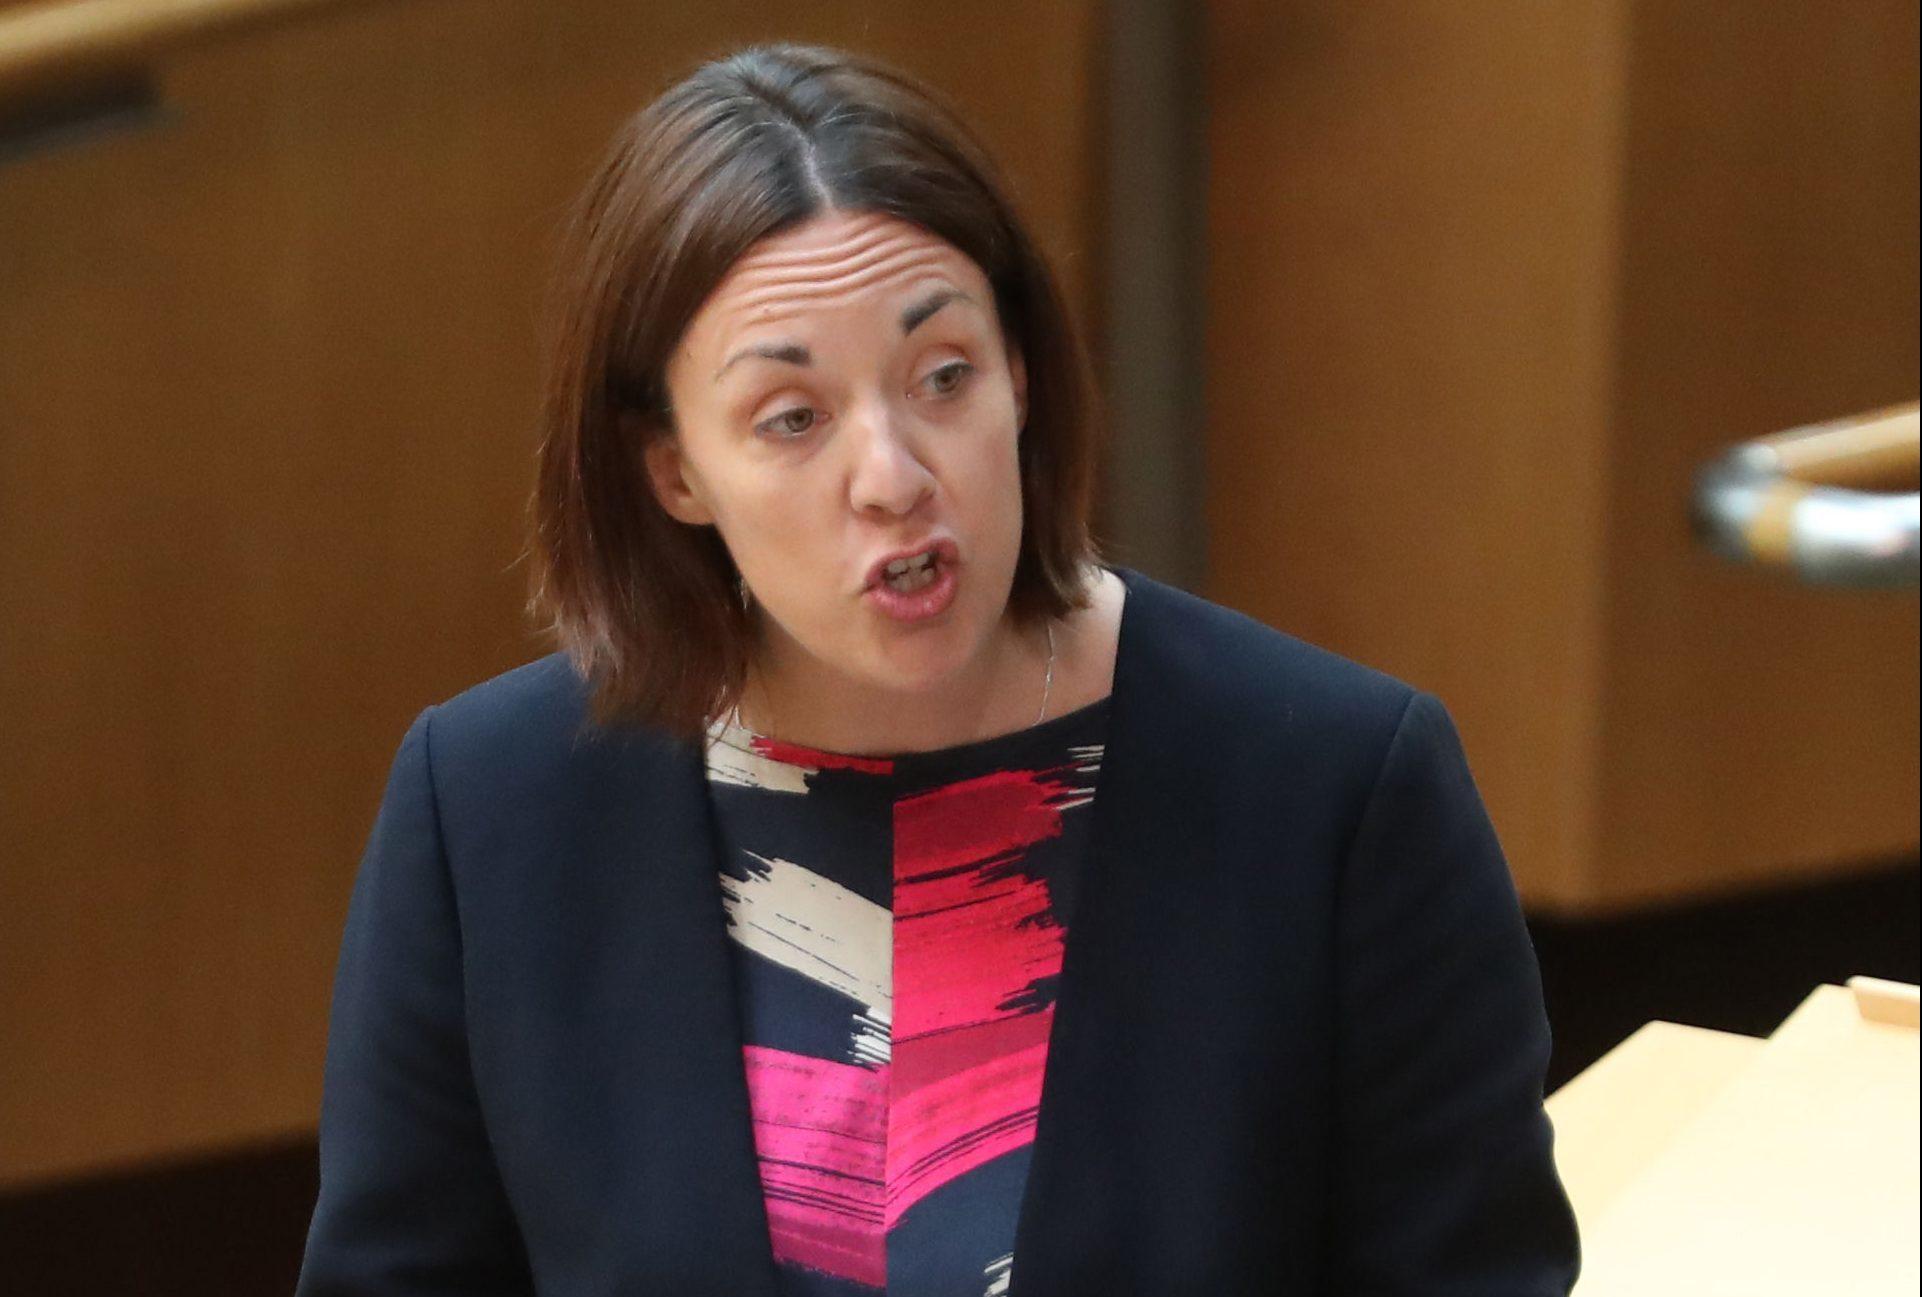 Scottish Labour leader Kezia Dugdale during FMQs at the Scottish Parliament in Edinburgh. (Andrew Milligan/PA Wire)